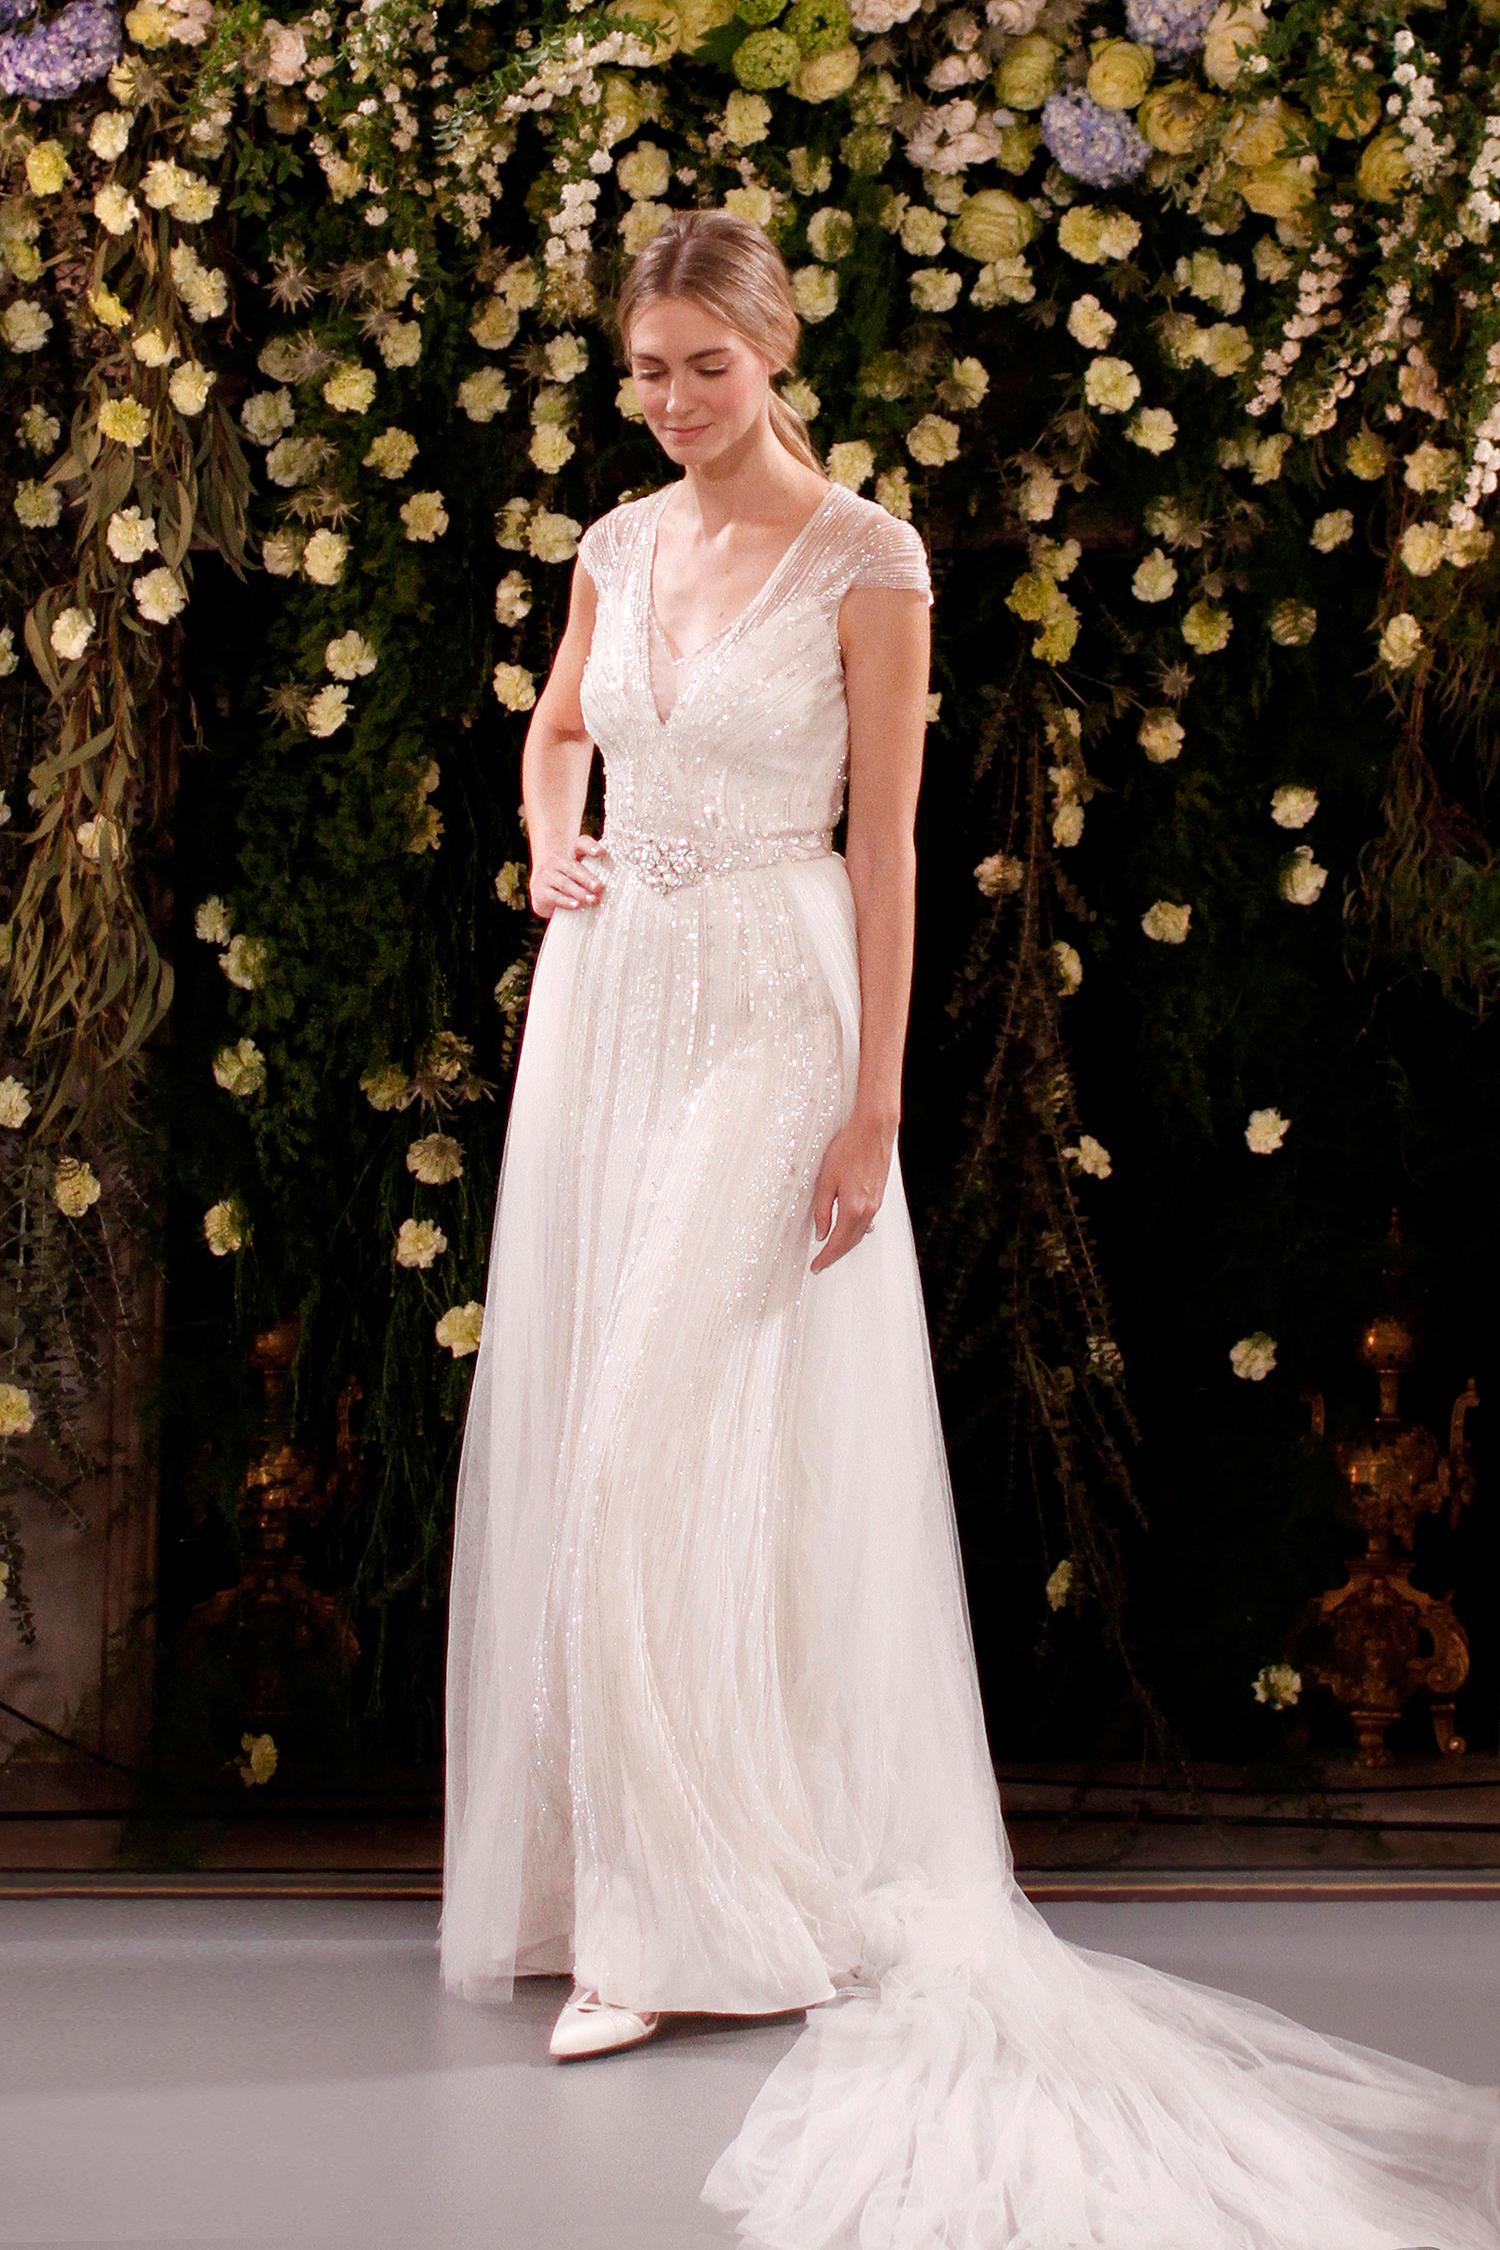 jenny packham wedding dress spring 2019 cap-sleeved embellished overlay